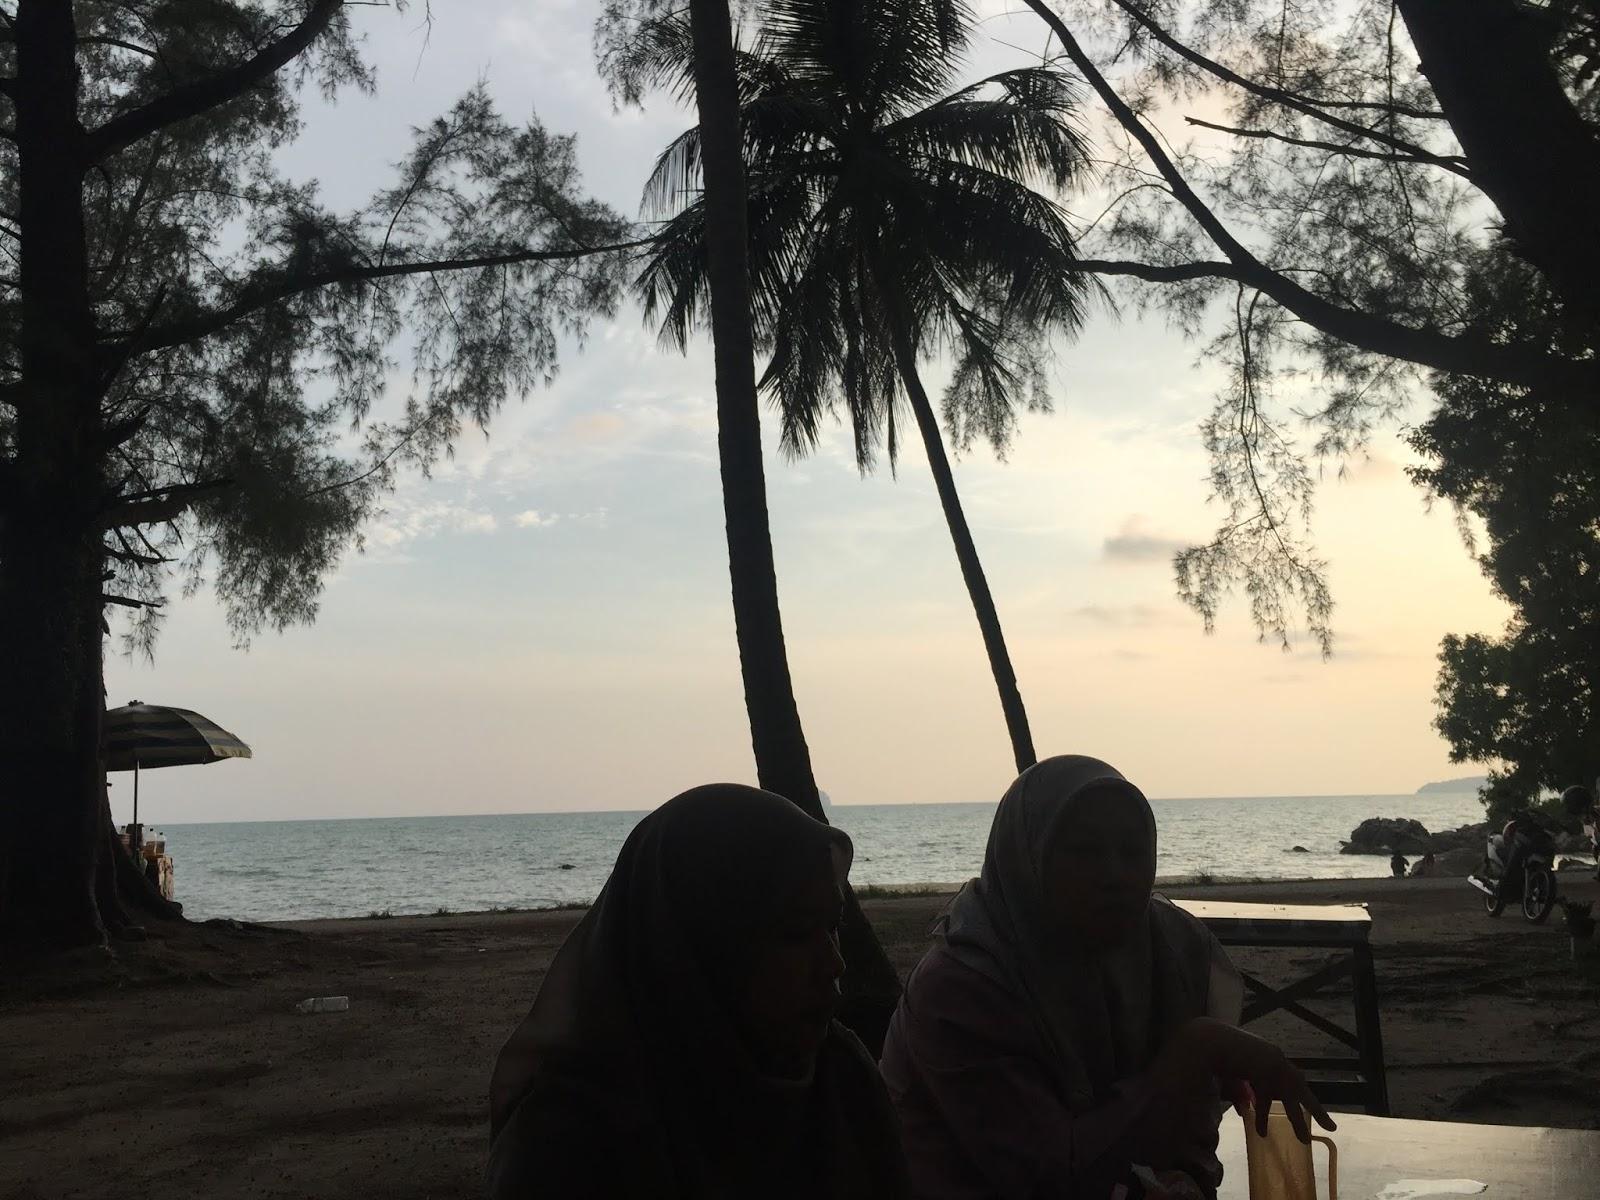 tempat makan sedap di penang, tempat makan best di pulau pinang